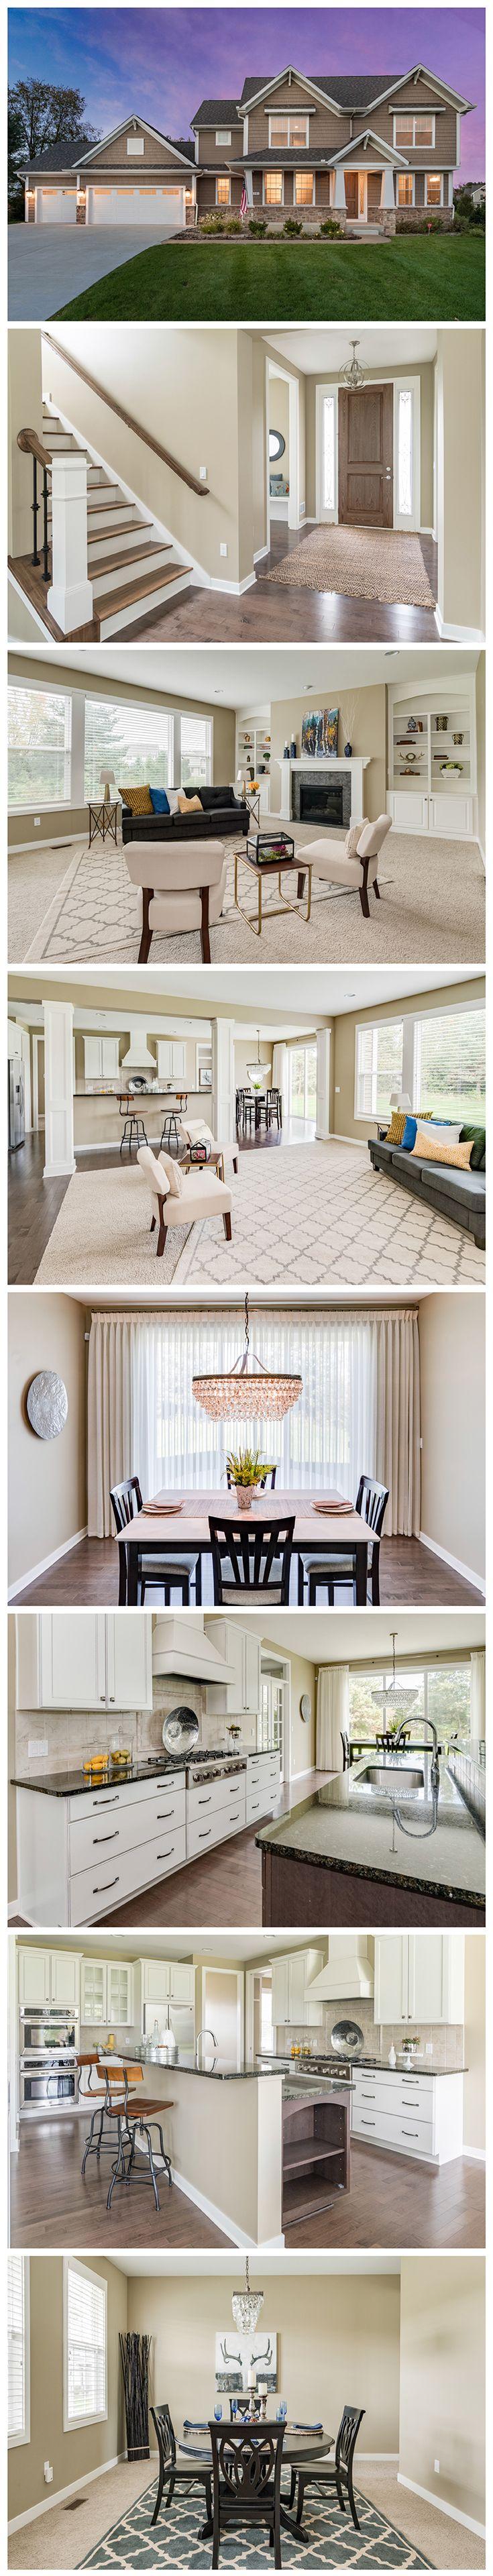 "Portage, MI | ""Beautiful hardwood & elegant high ceilings/tall doors...Gourmet Kitchen with granite counters, custom upgrades & handmade range hood...Designer chandeliers..."""